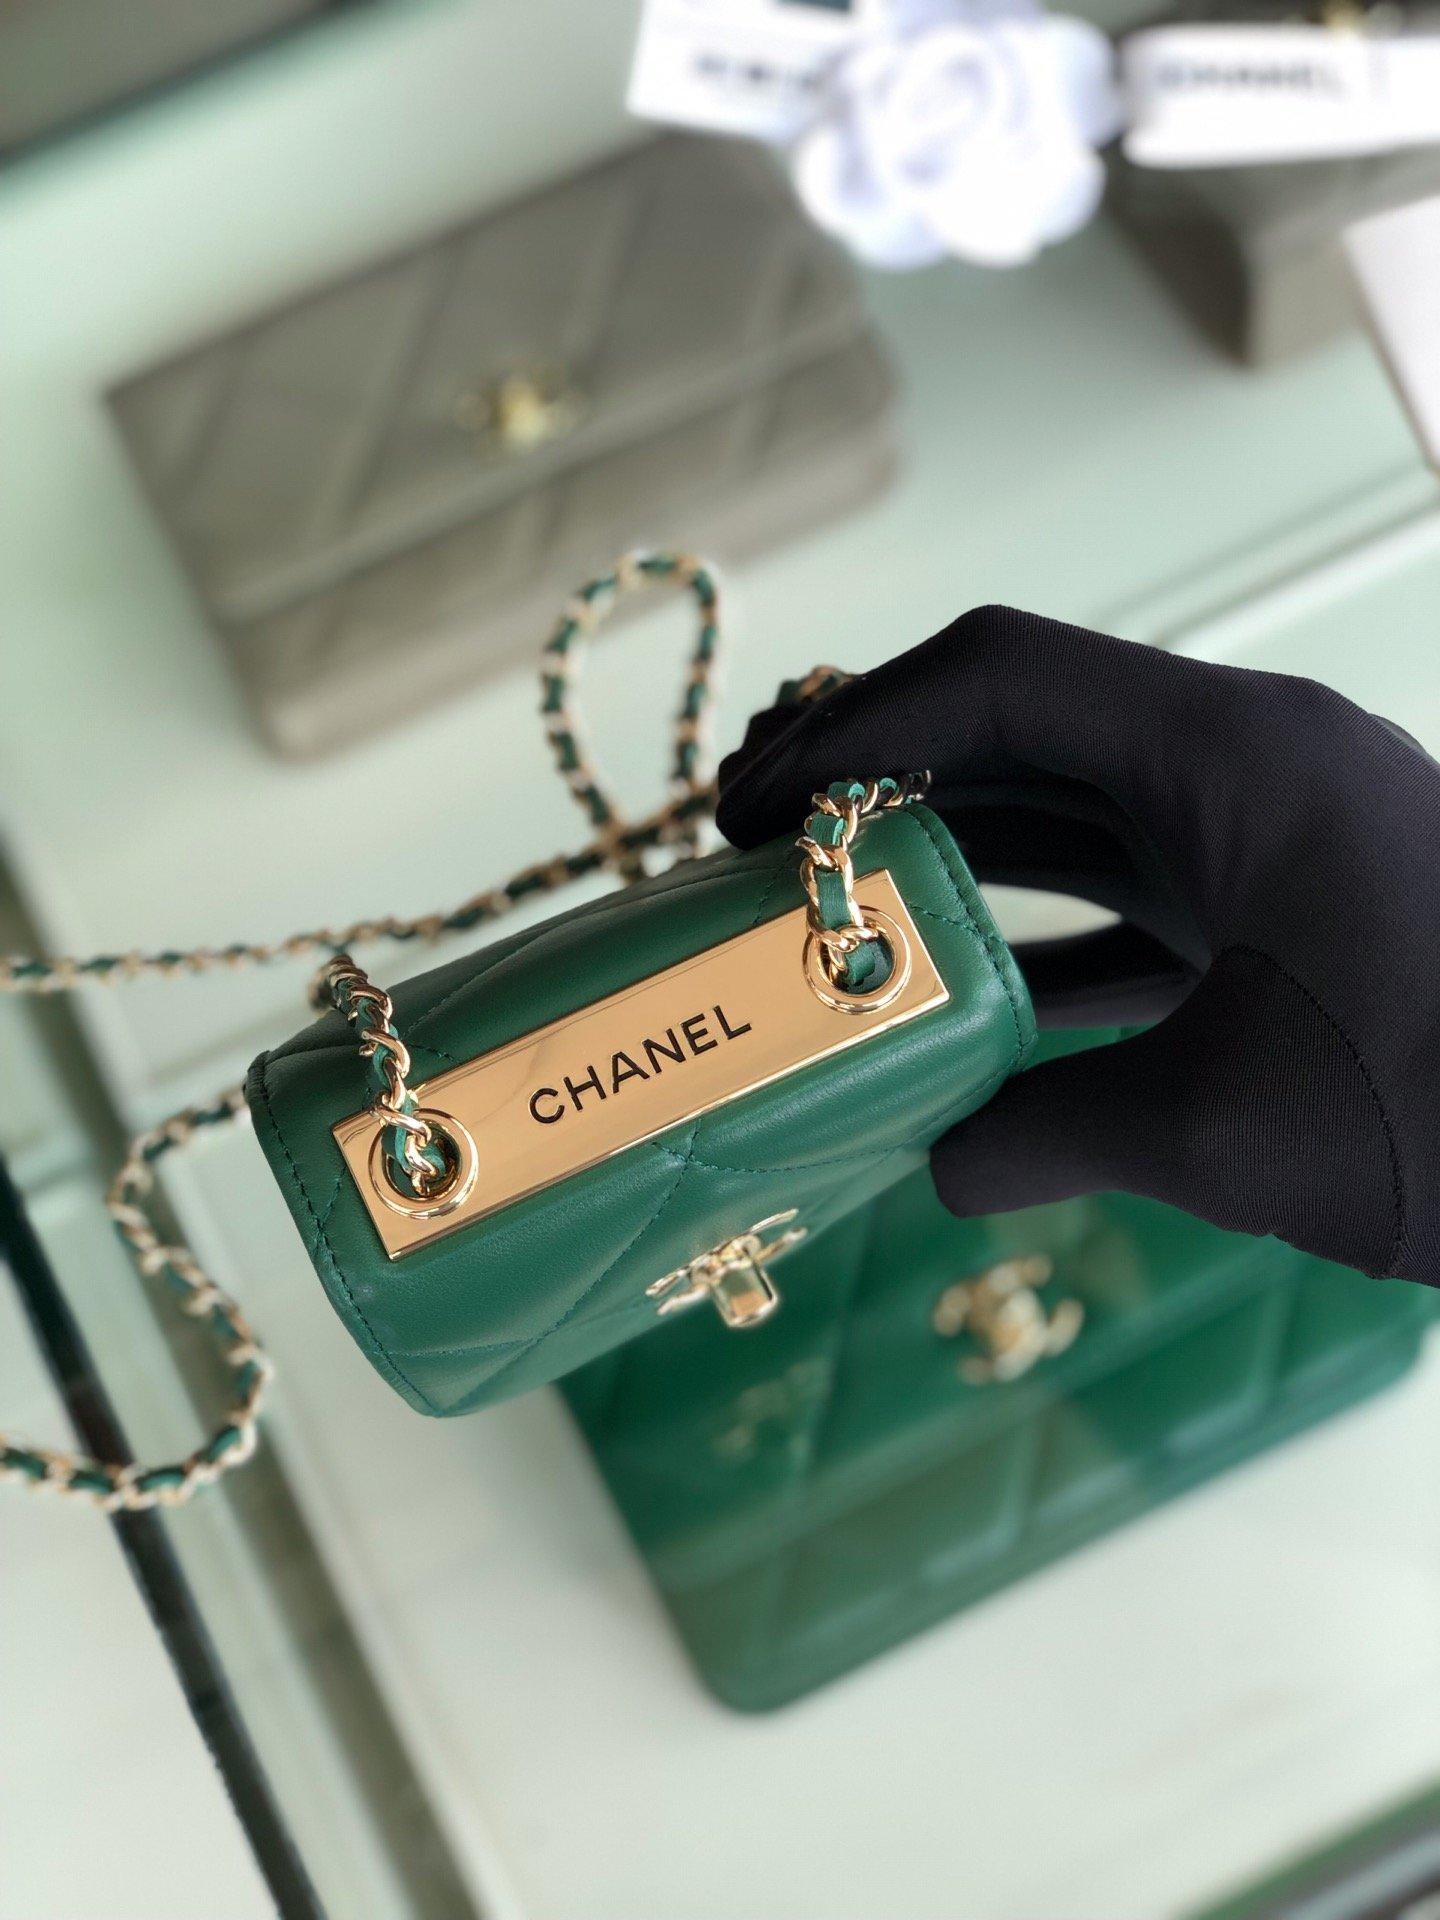 Chanel香奈儿专柜同款 大方格新款零钱包 单肩斜挎(图5)